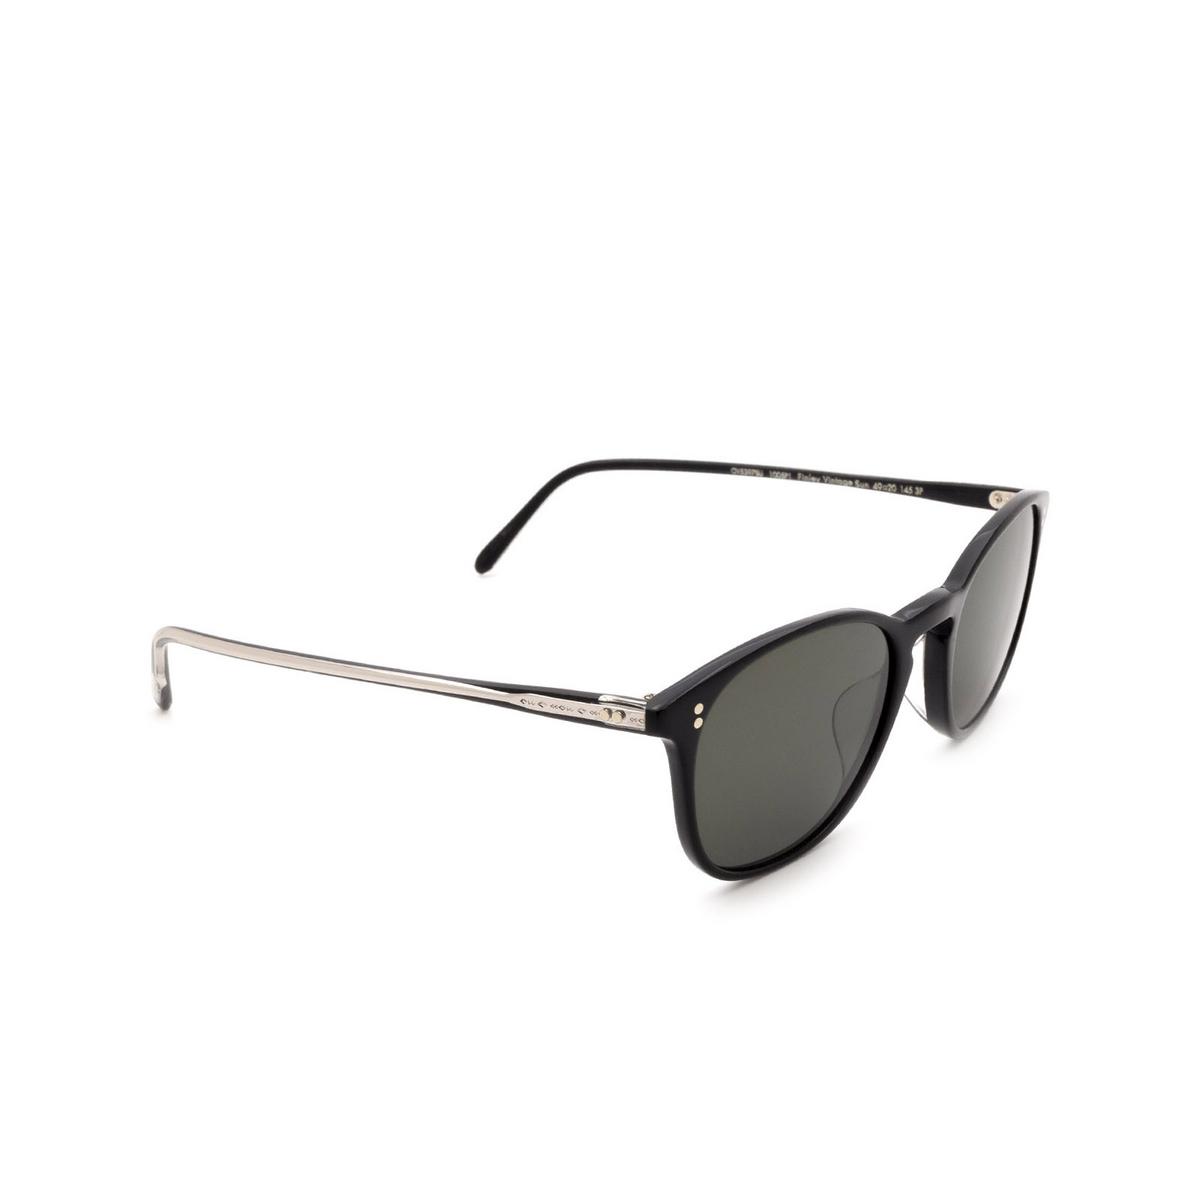 Oliver Peoples® Square Sunglasses: Finley Vintage Sun OV5397SU color Black 1005P1.